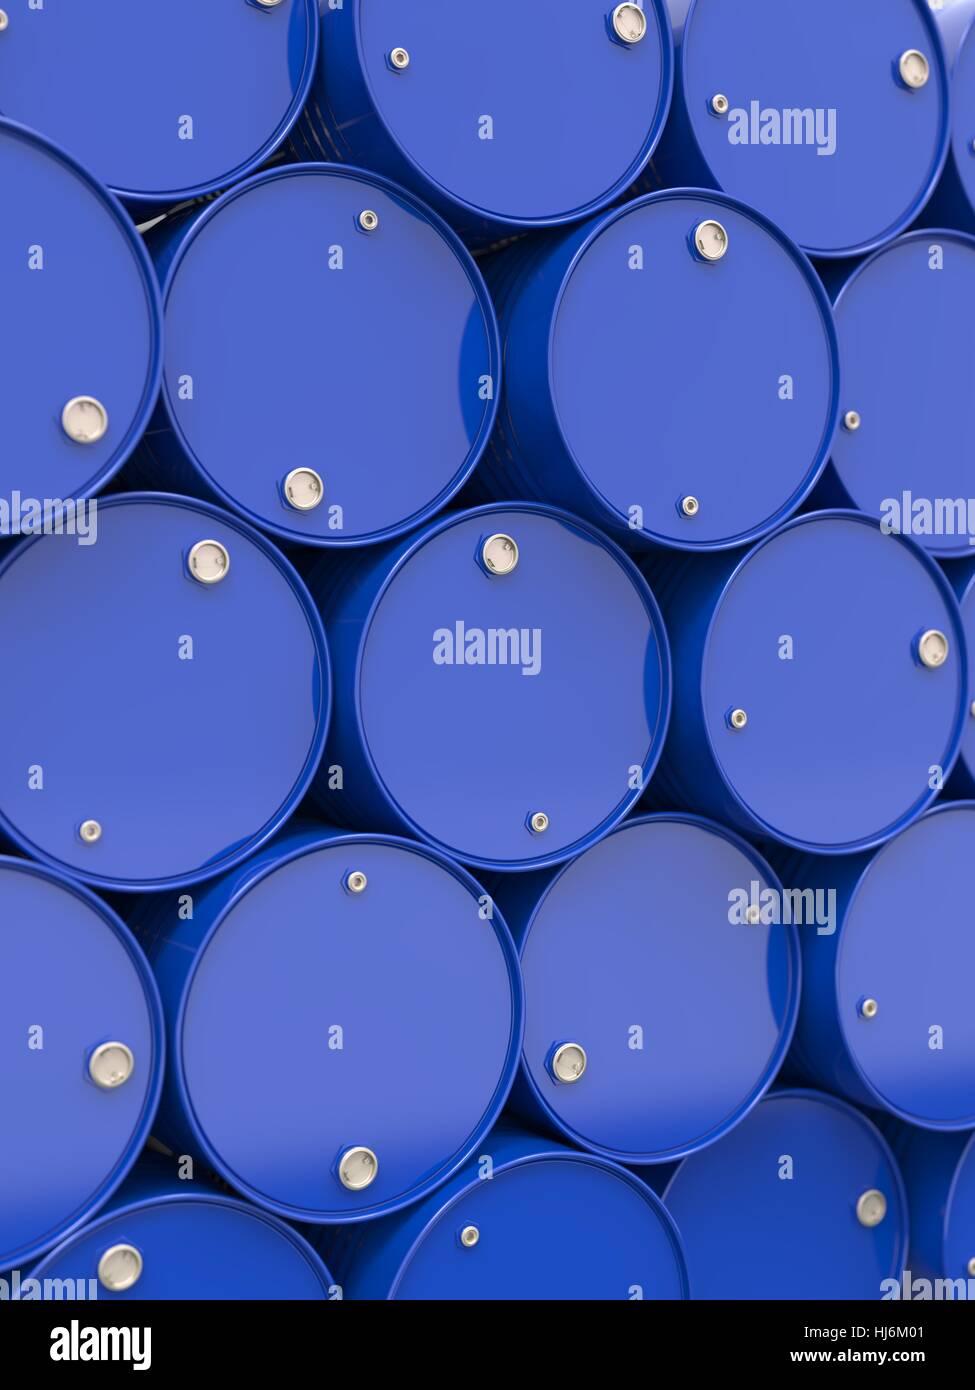 blue, danger, objects, liquid, environment, enviroment, colour Stock